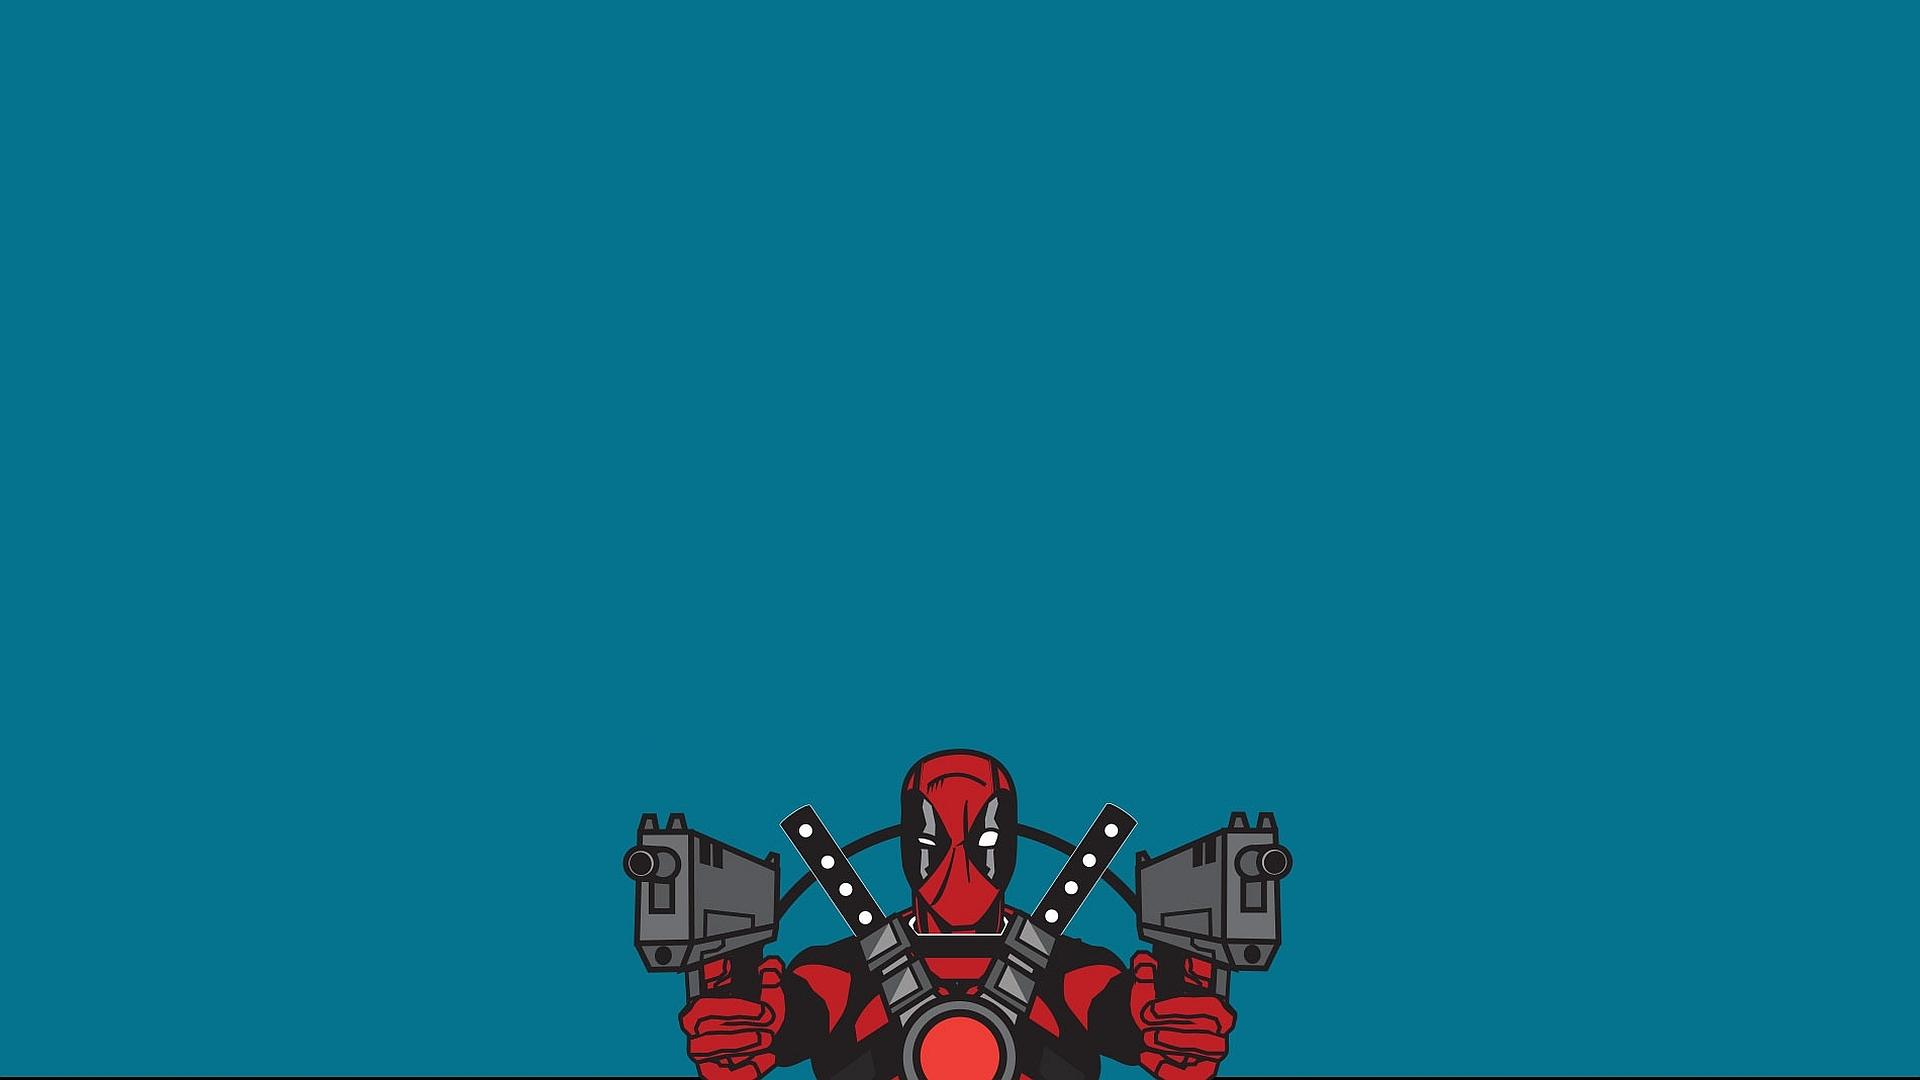 Deadpool Hd Wallpaper Background Image 1920x1080 Id 463101